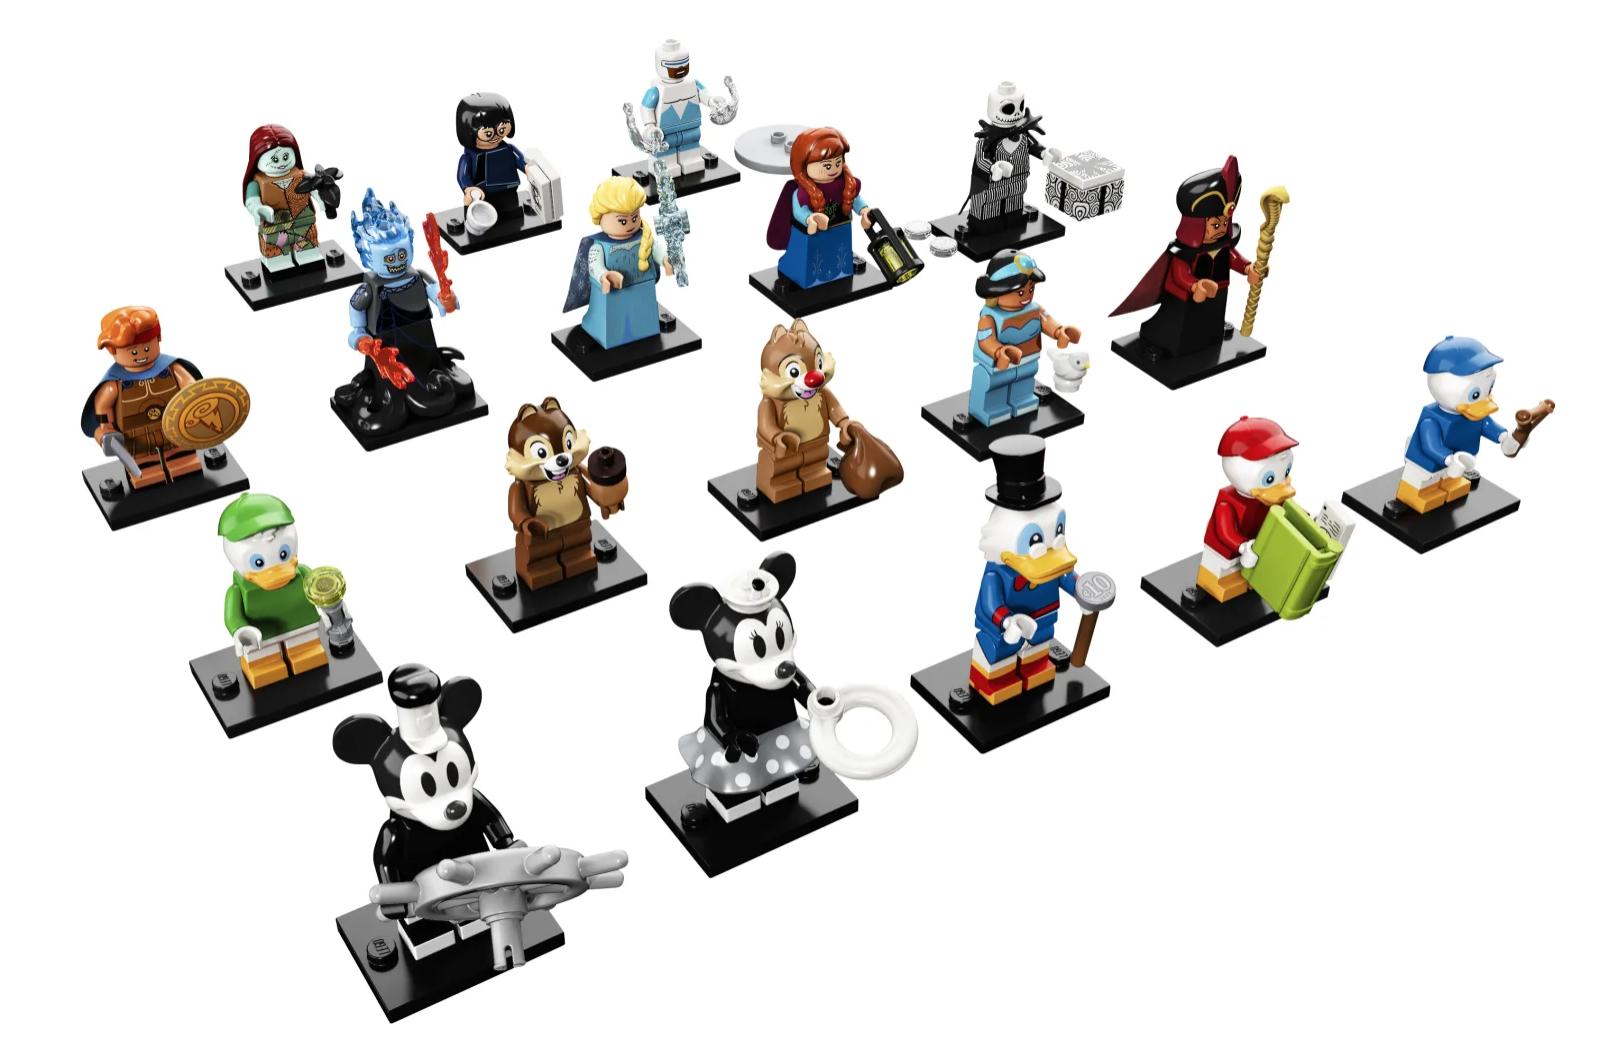 LEGO x Disney